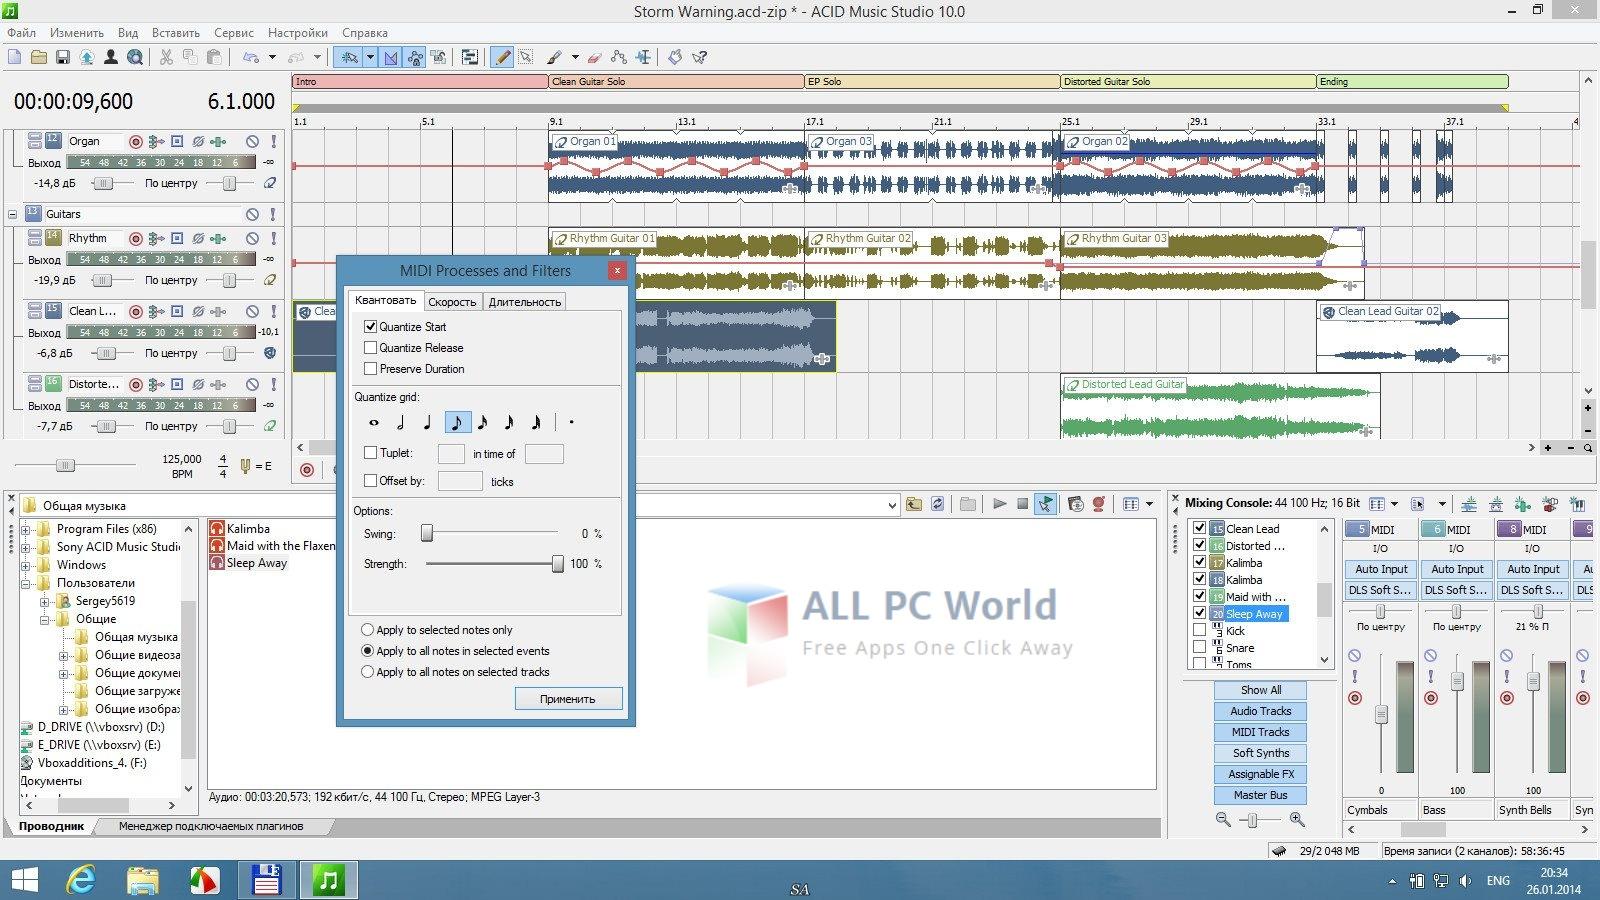 MAGIX Acid Music Studio 10.0 Build 134 Multilingual Portable Review